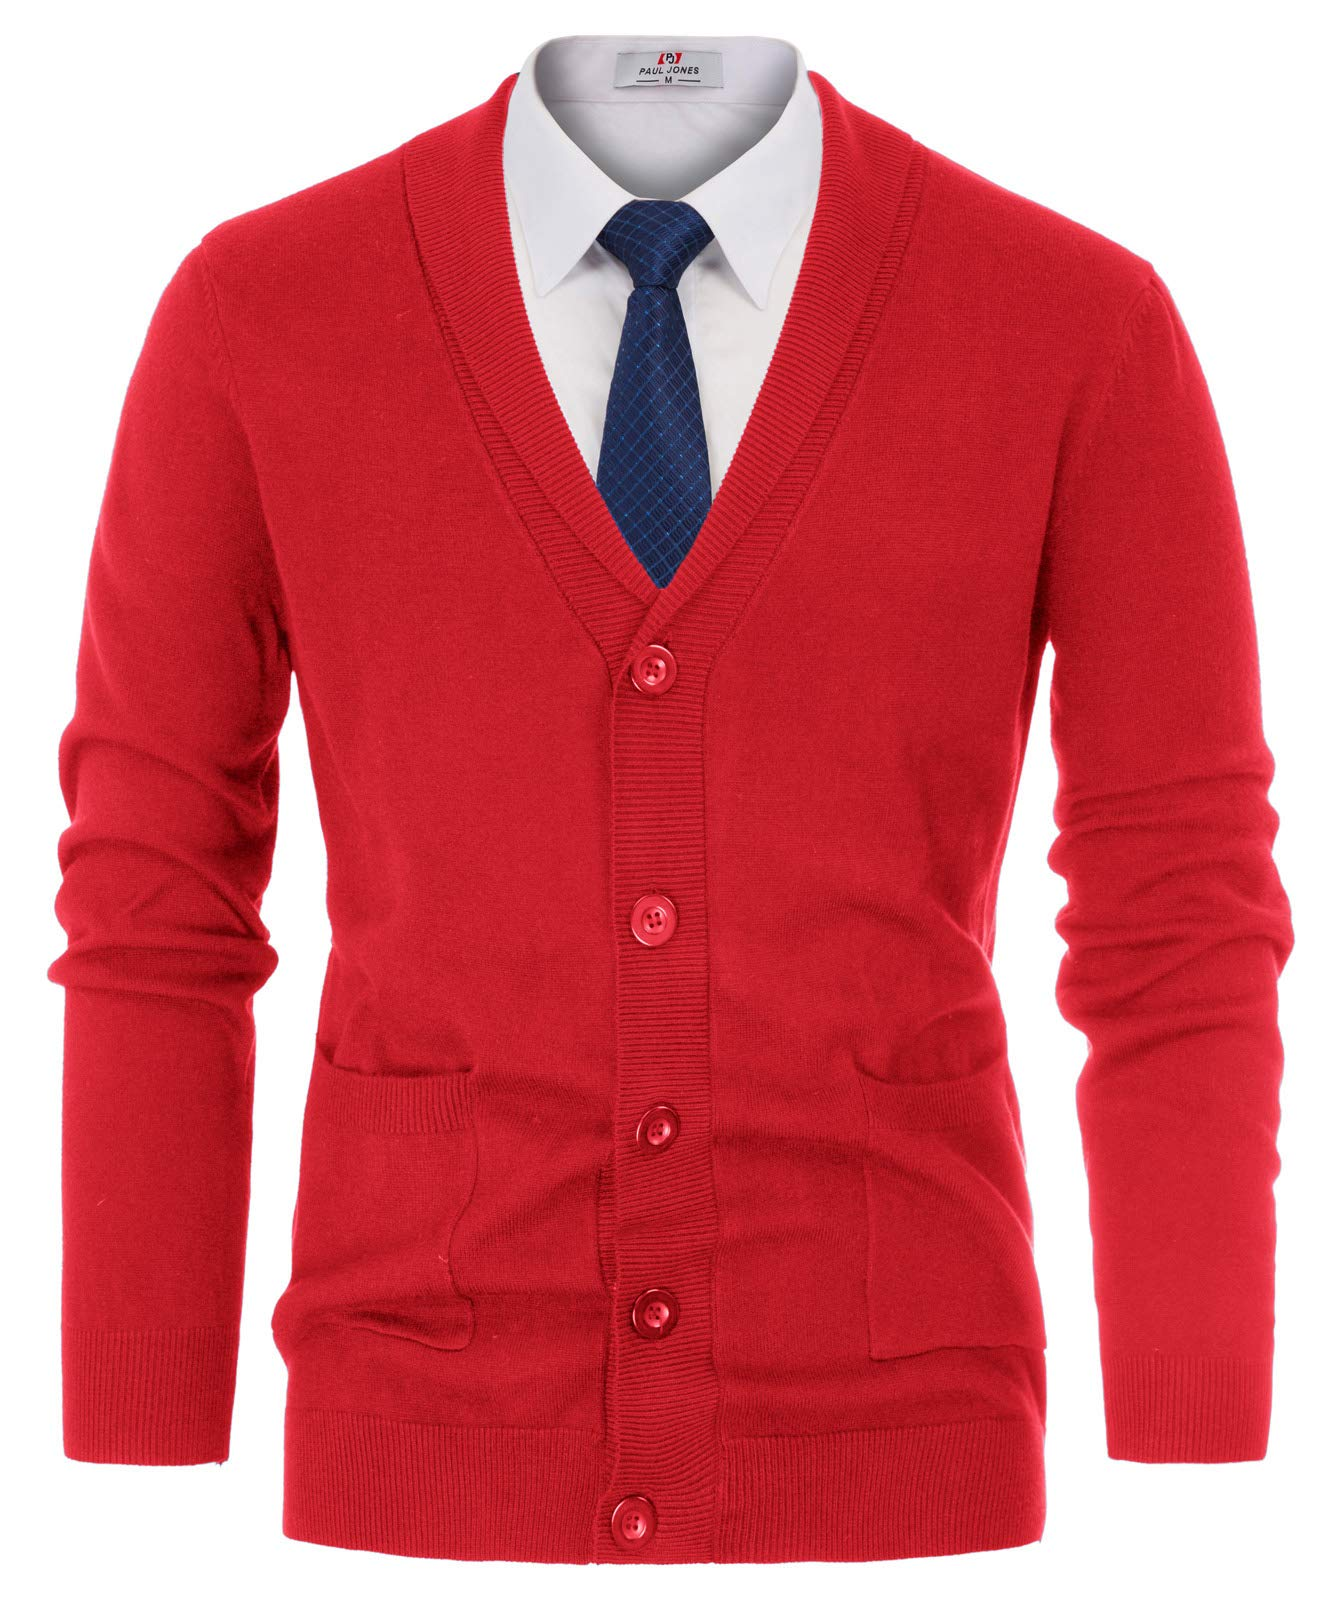 PAUL JONES Mens Shawl Collar Cardigan Sweater Button Front Knitwear Size 2XL Red by PAUL JONES